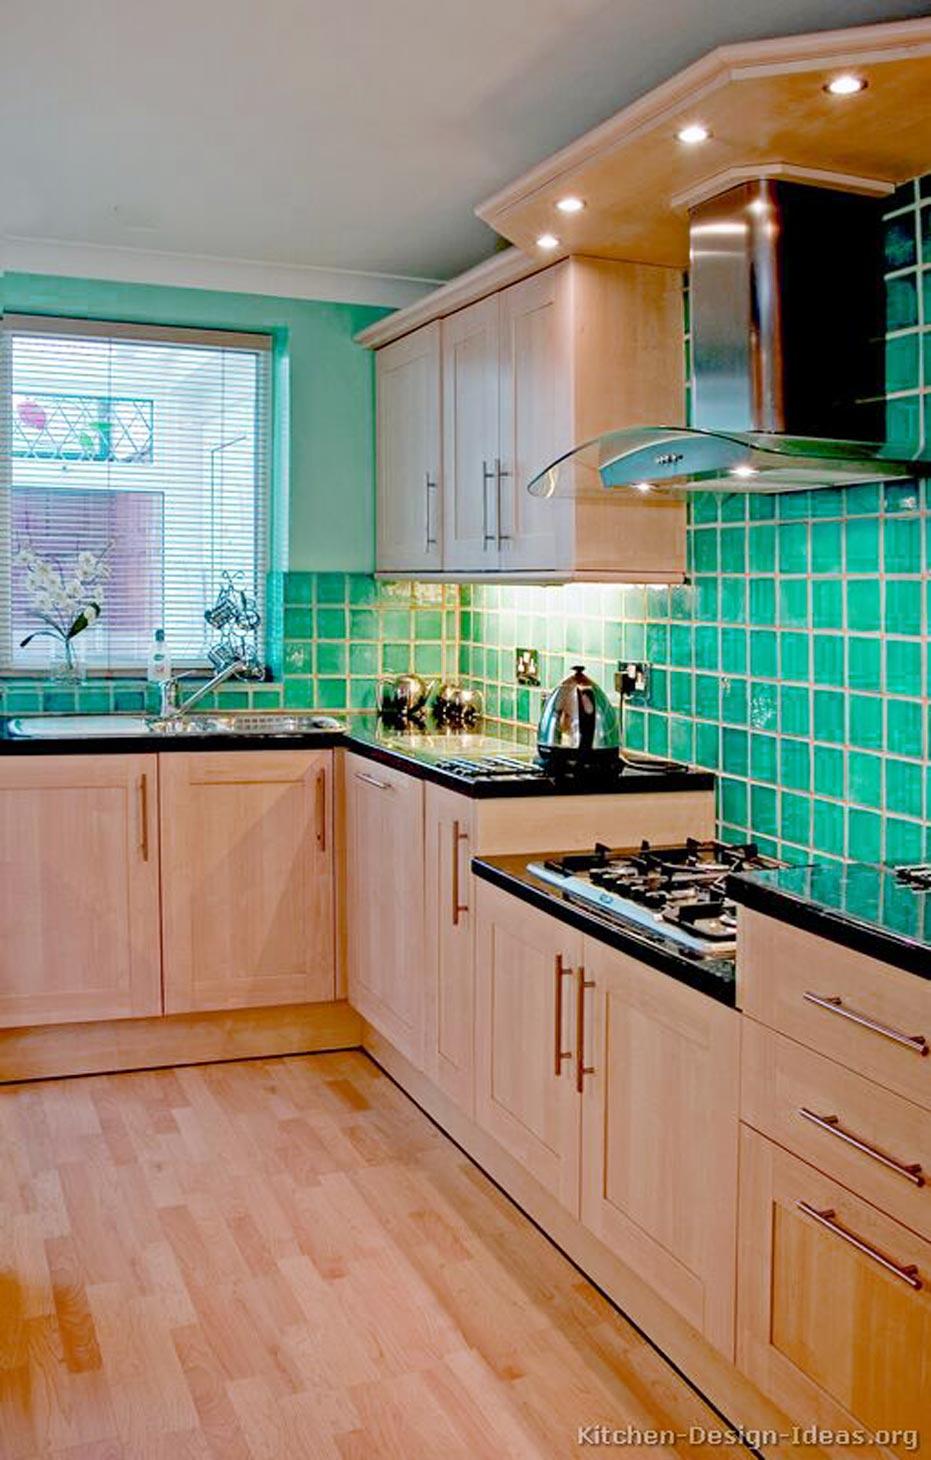 Turquoise kitchen backsplash ideas for Kitchen ideas turquoise